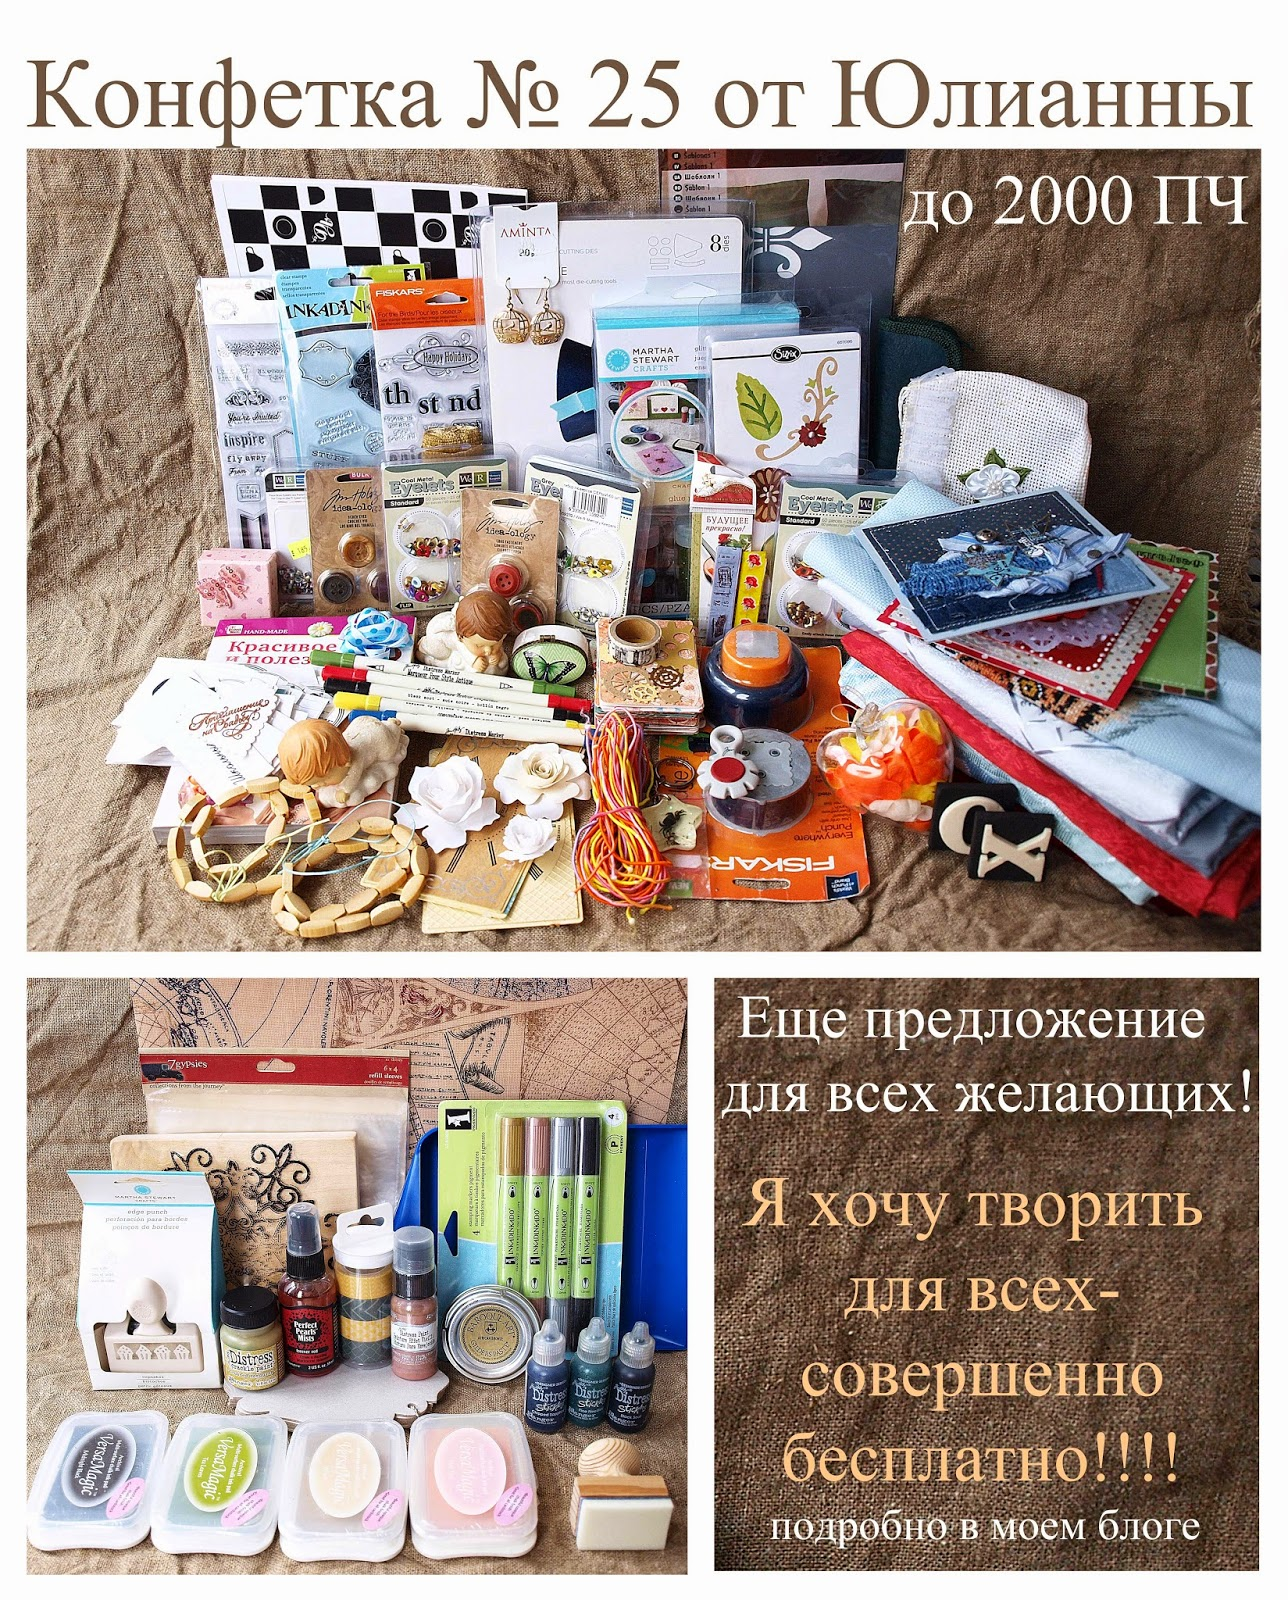 Конфетка №25 до 2000 ПЧ